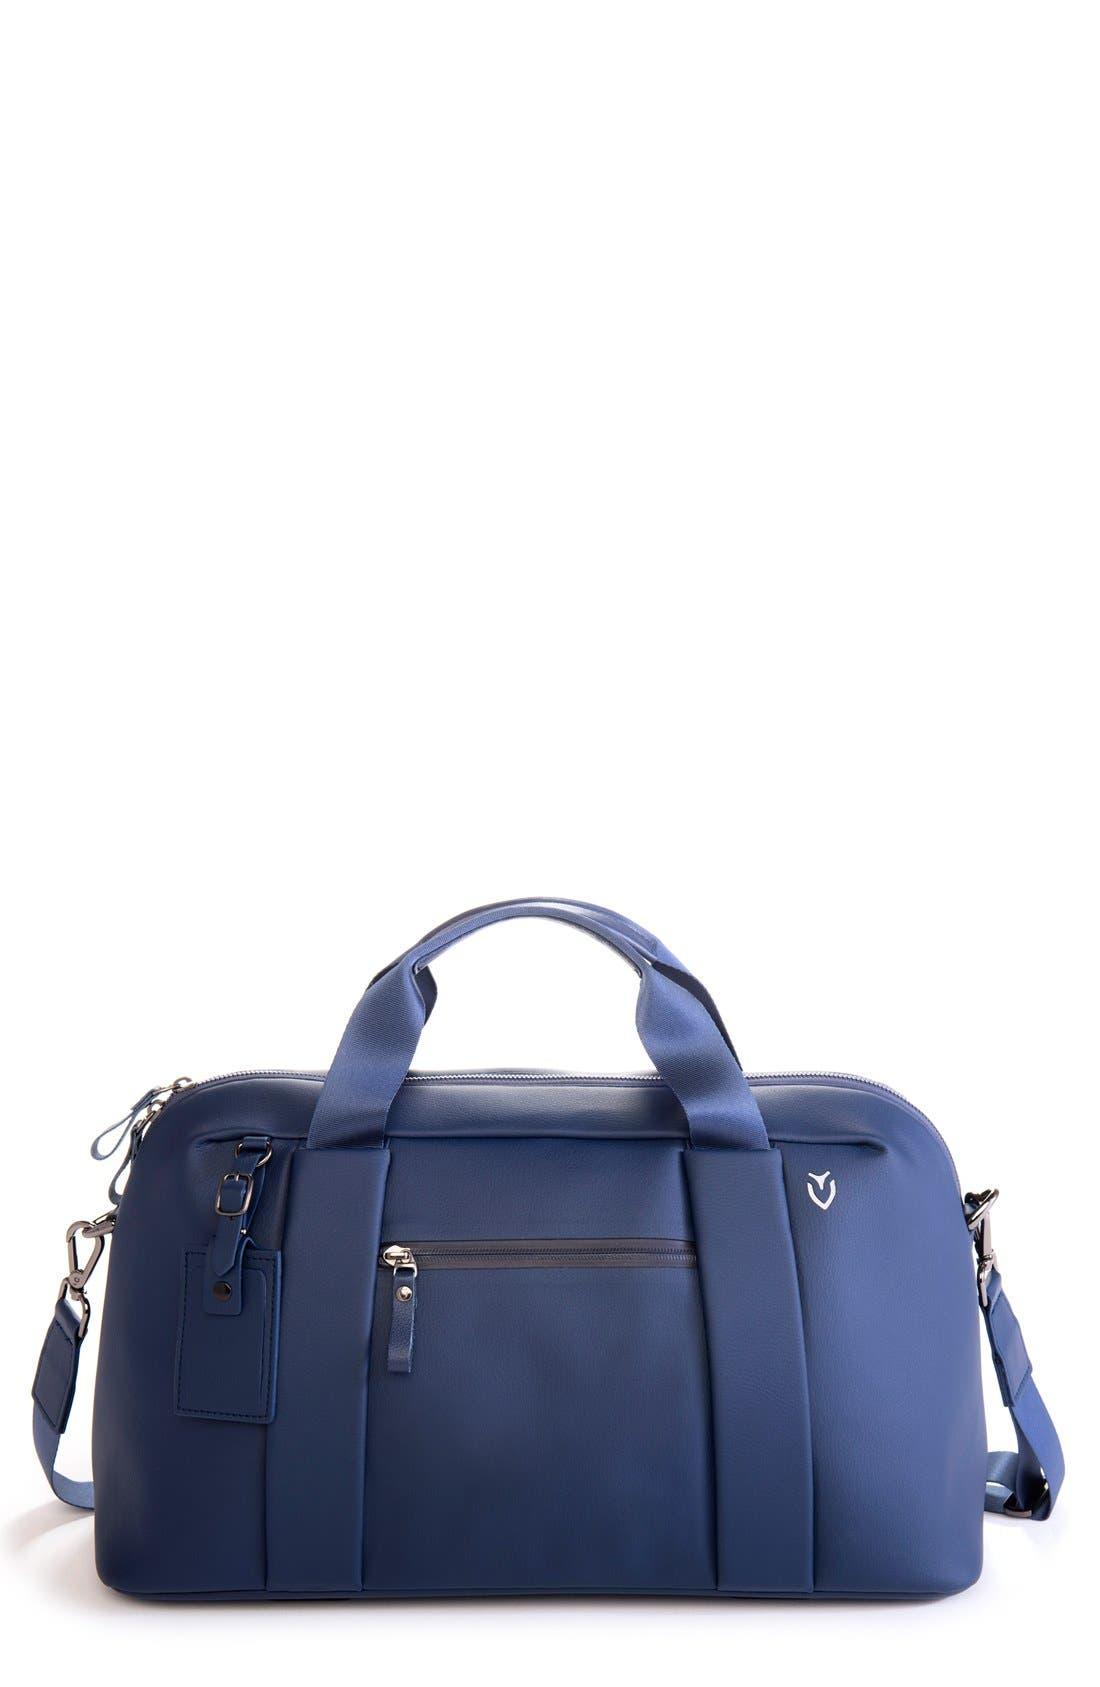 Vessel 'Signature' Medium Duffel Bag